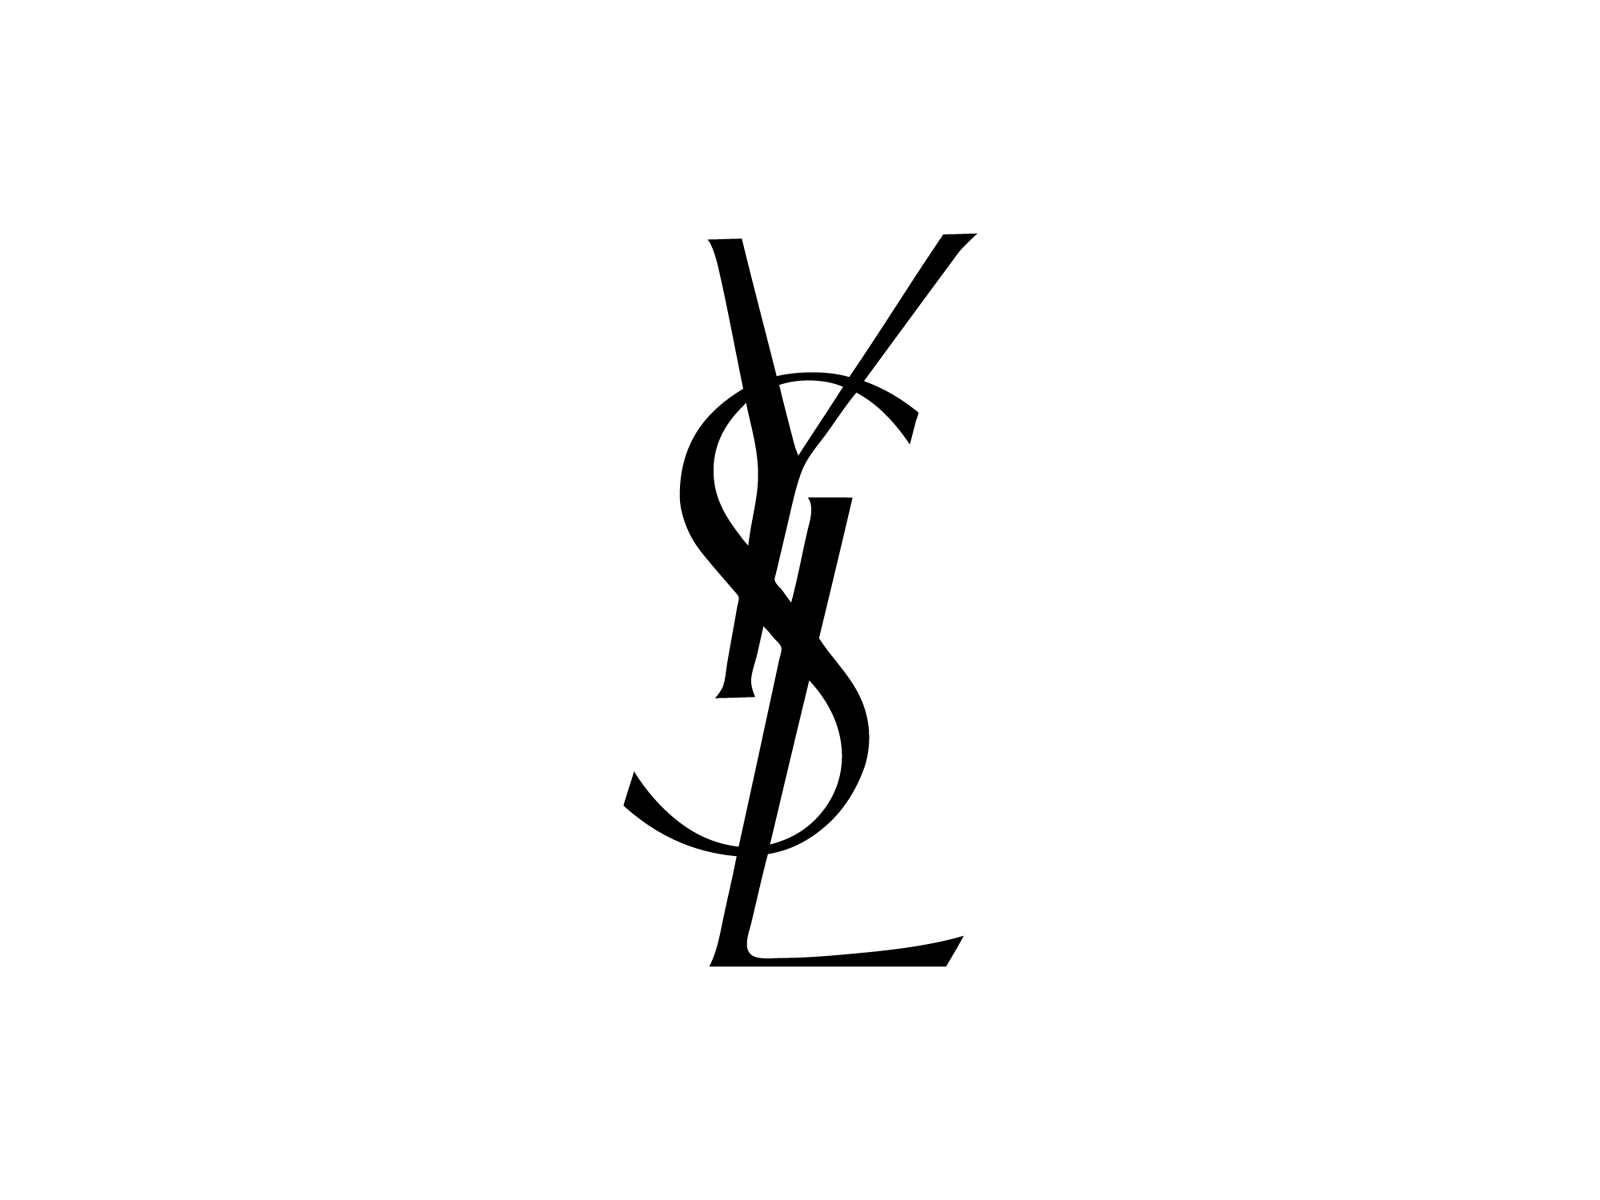 Logo Yves Saint Laurent PNG transparents - StickPNG